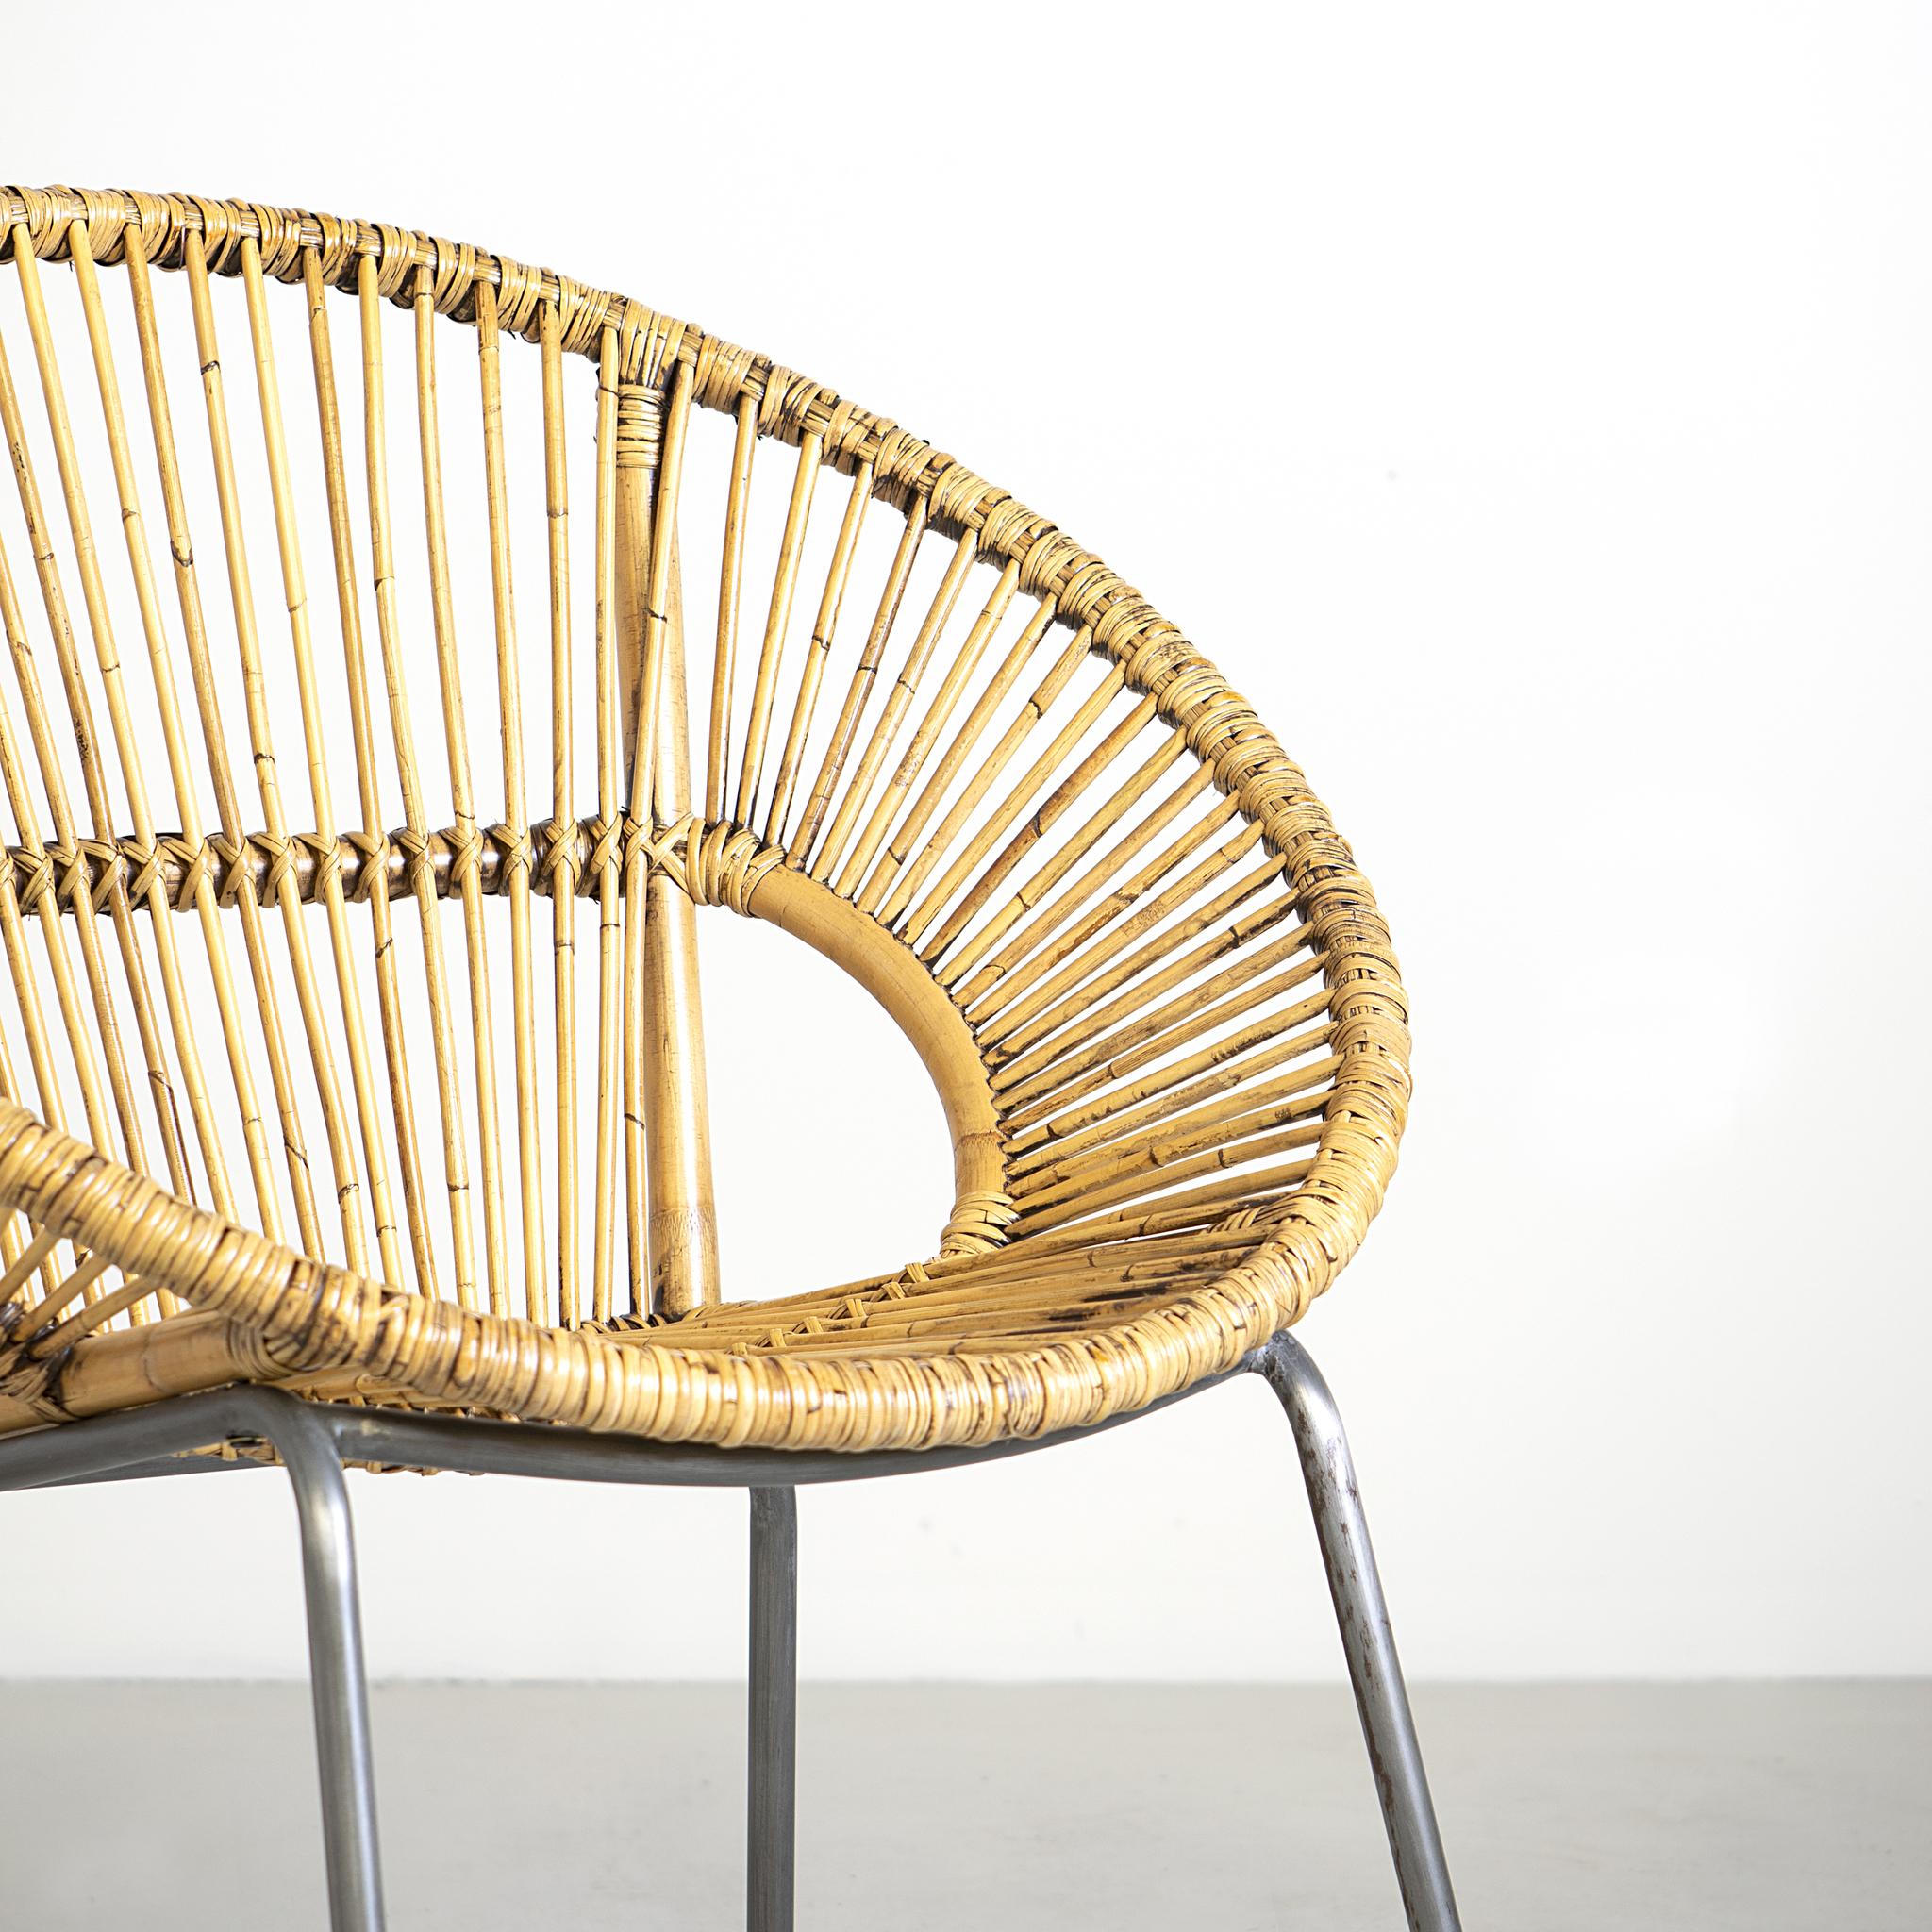 Round Rattan Chair W/ Metal Legs   K/D (31X27.8X31.